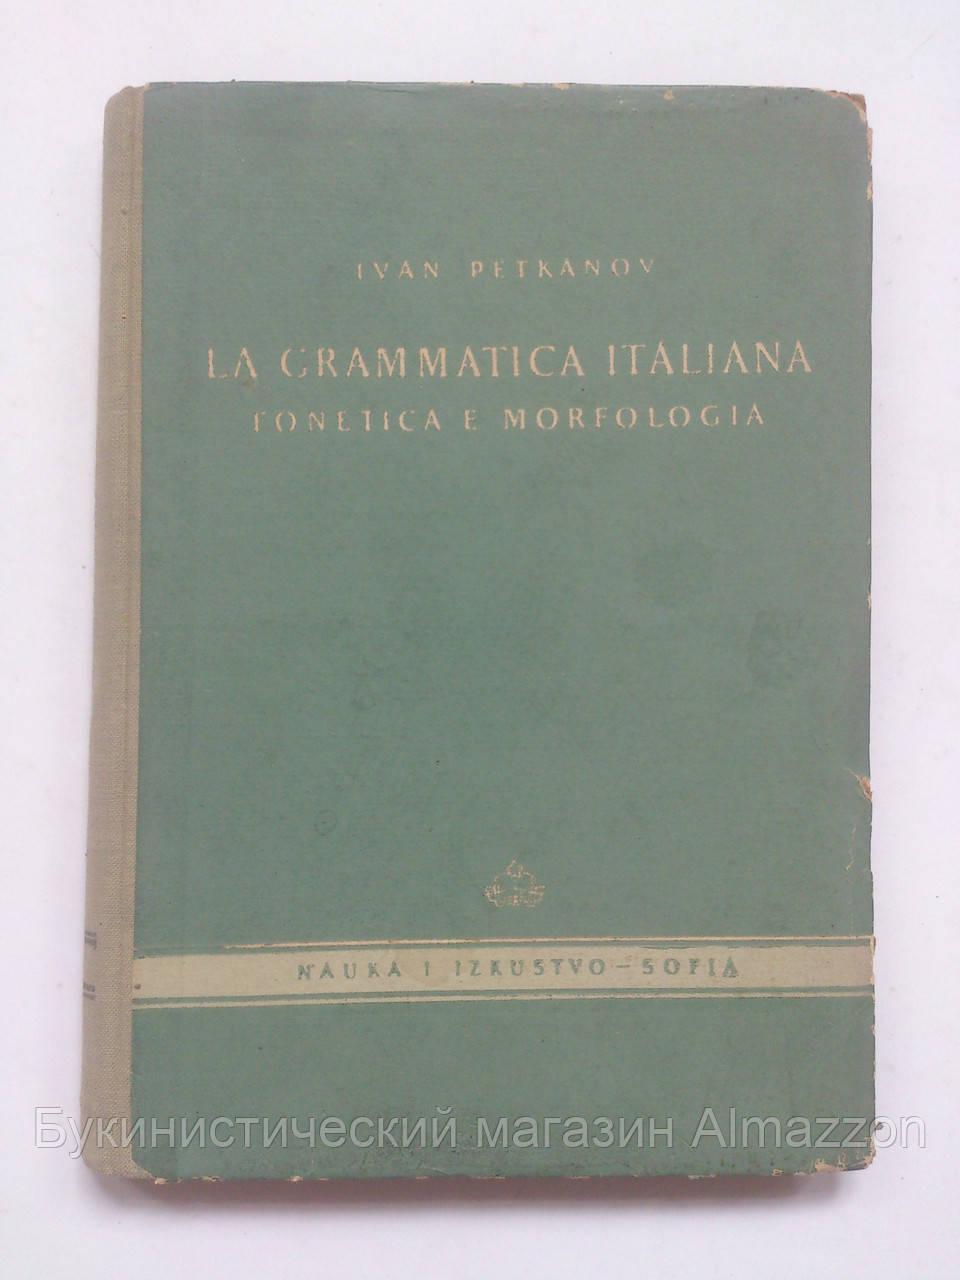 La Grammatica Italiana Fonetica e Morfologia. Ivan Petkanov